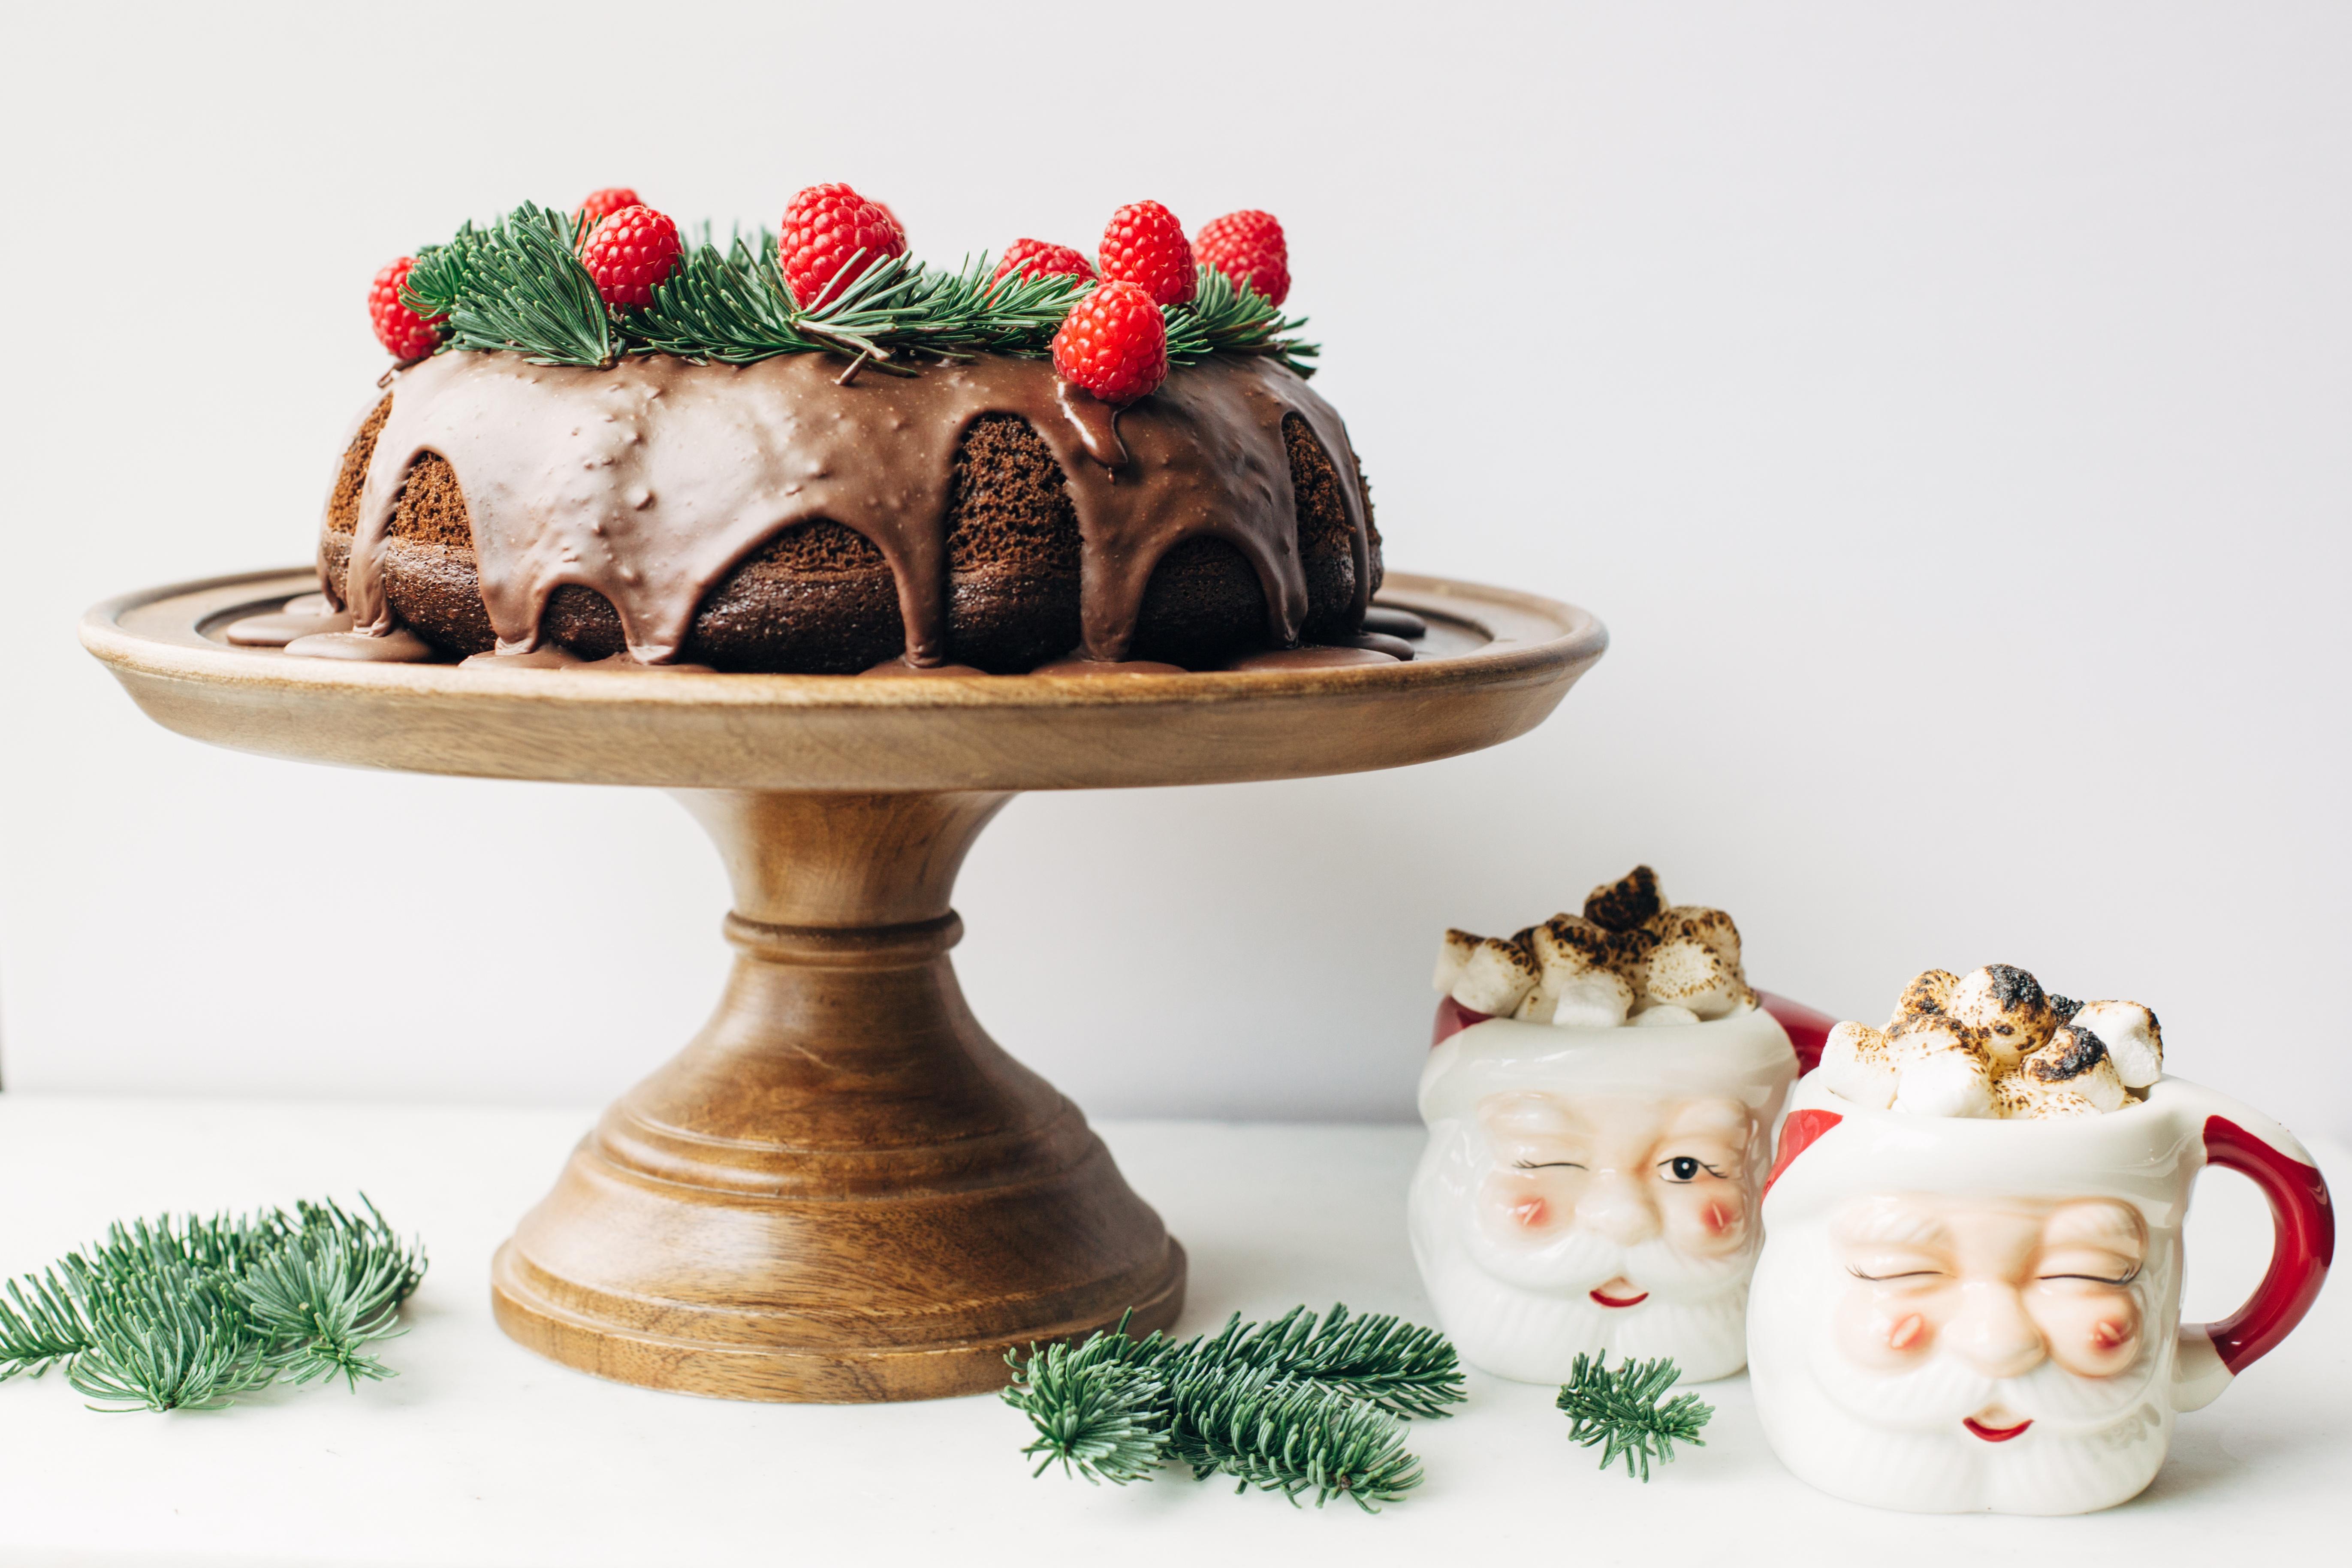 Chocolate Raspberry + Red Wine Wreath Bundt Cake